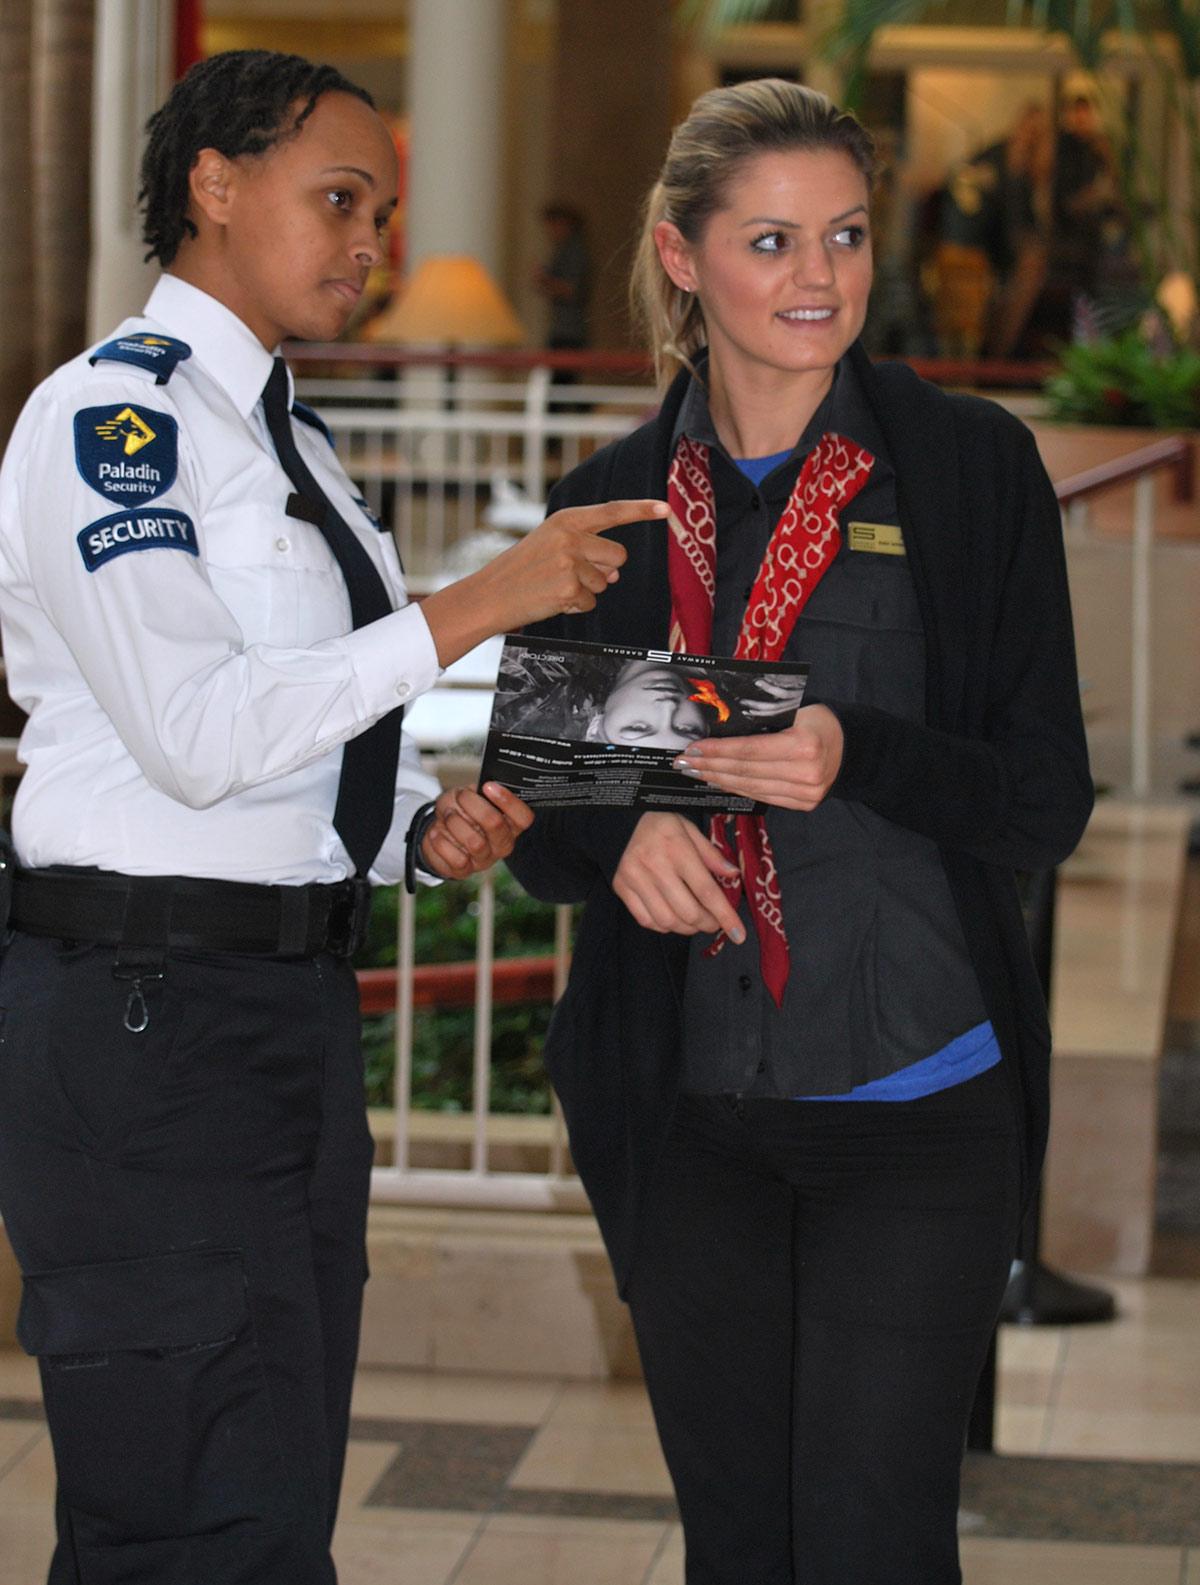 paladin-security-retail-security-guards - PalAmerican Security